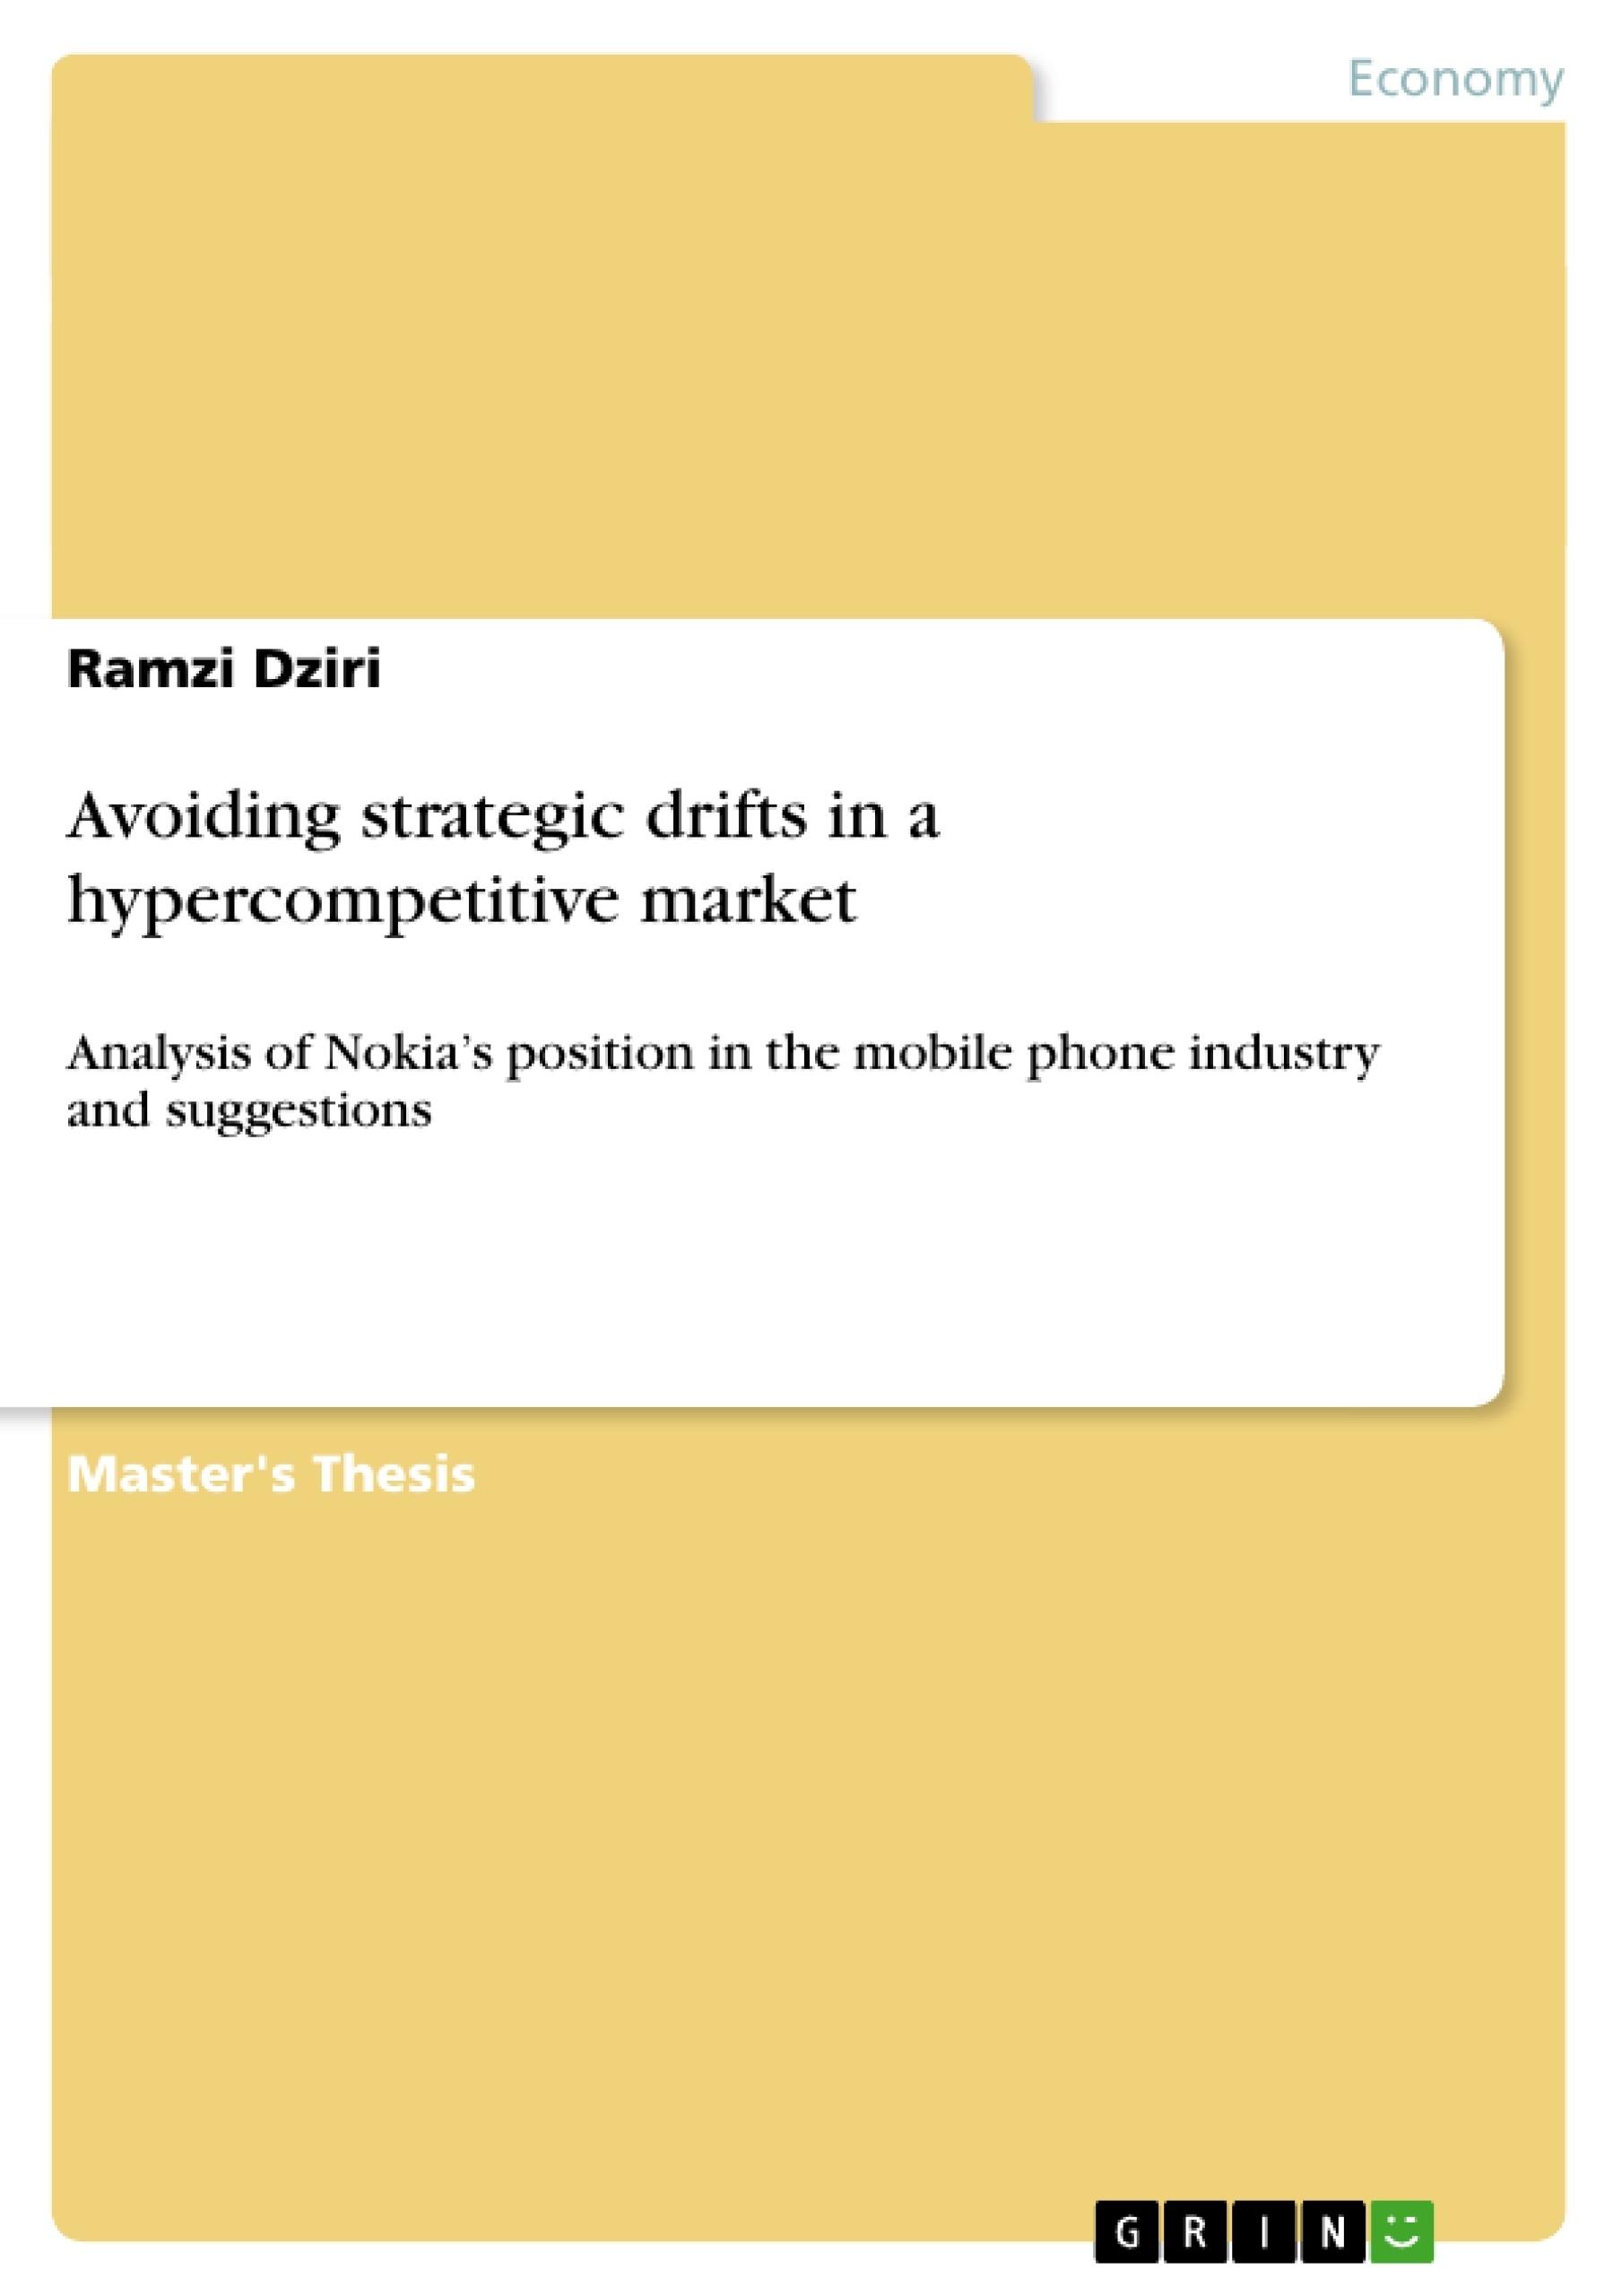 Title: Avoiding strategic drifts in a hypercompetitive market